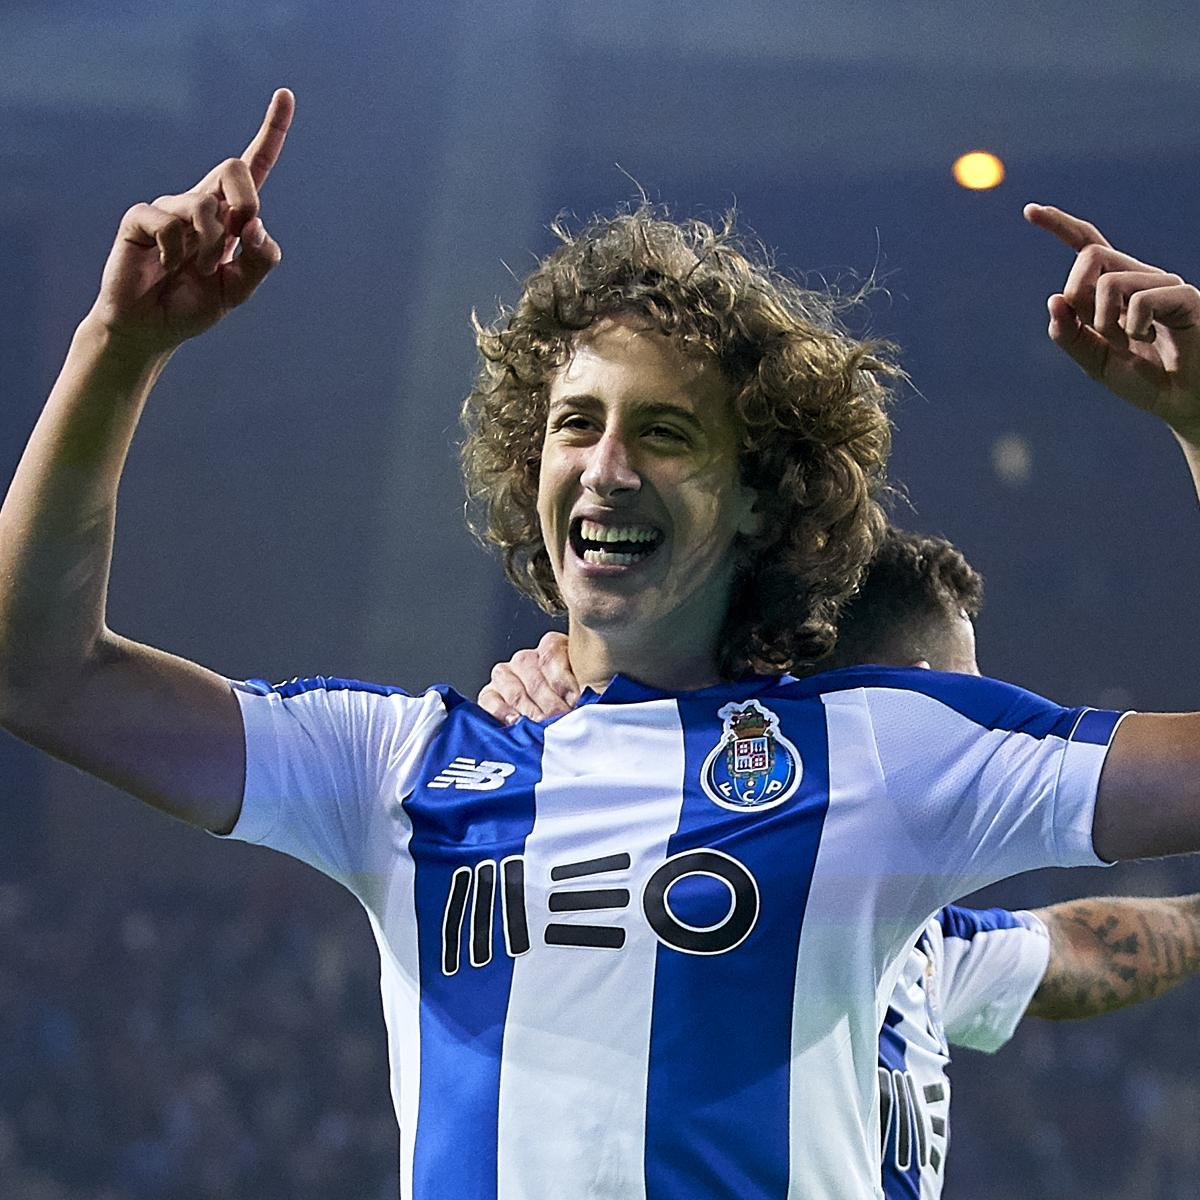 Porto's Fabio Silva: The 17-Year-Old '€125M Striker' Destined for Big Things